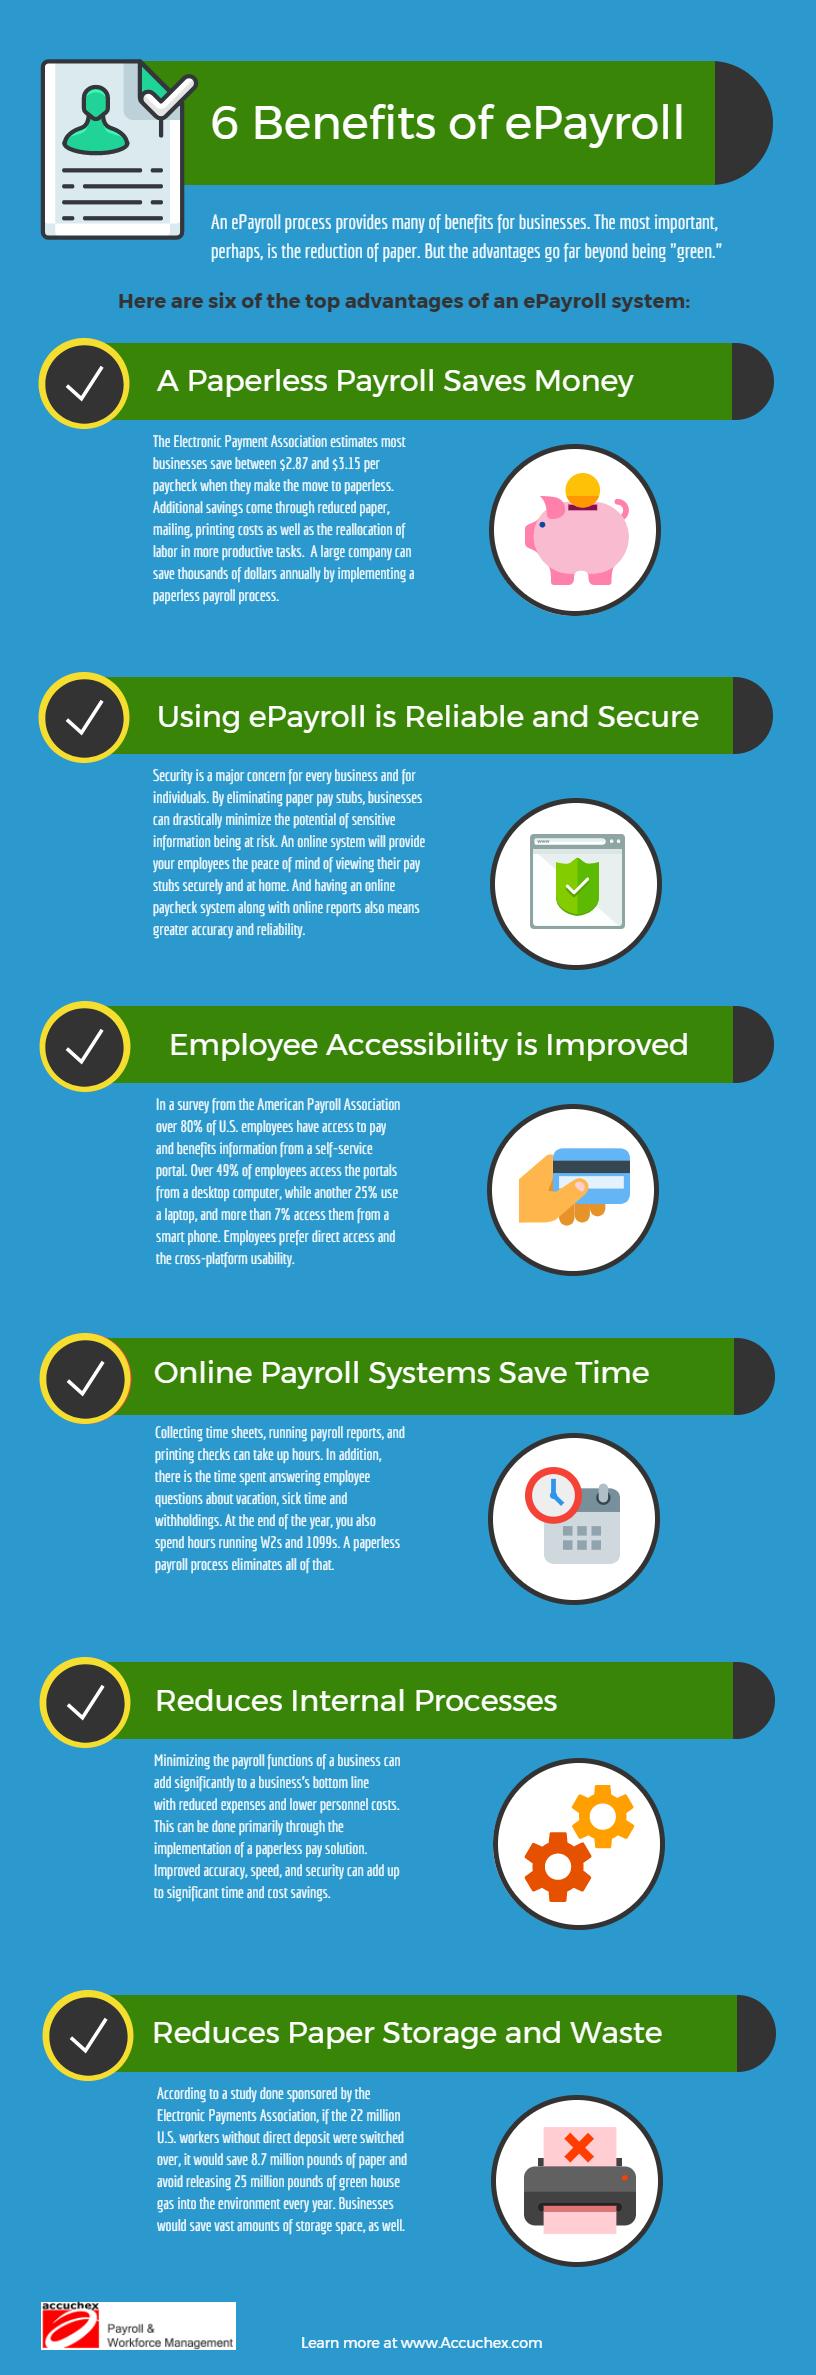 6 Benefits of ePayroll.png